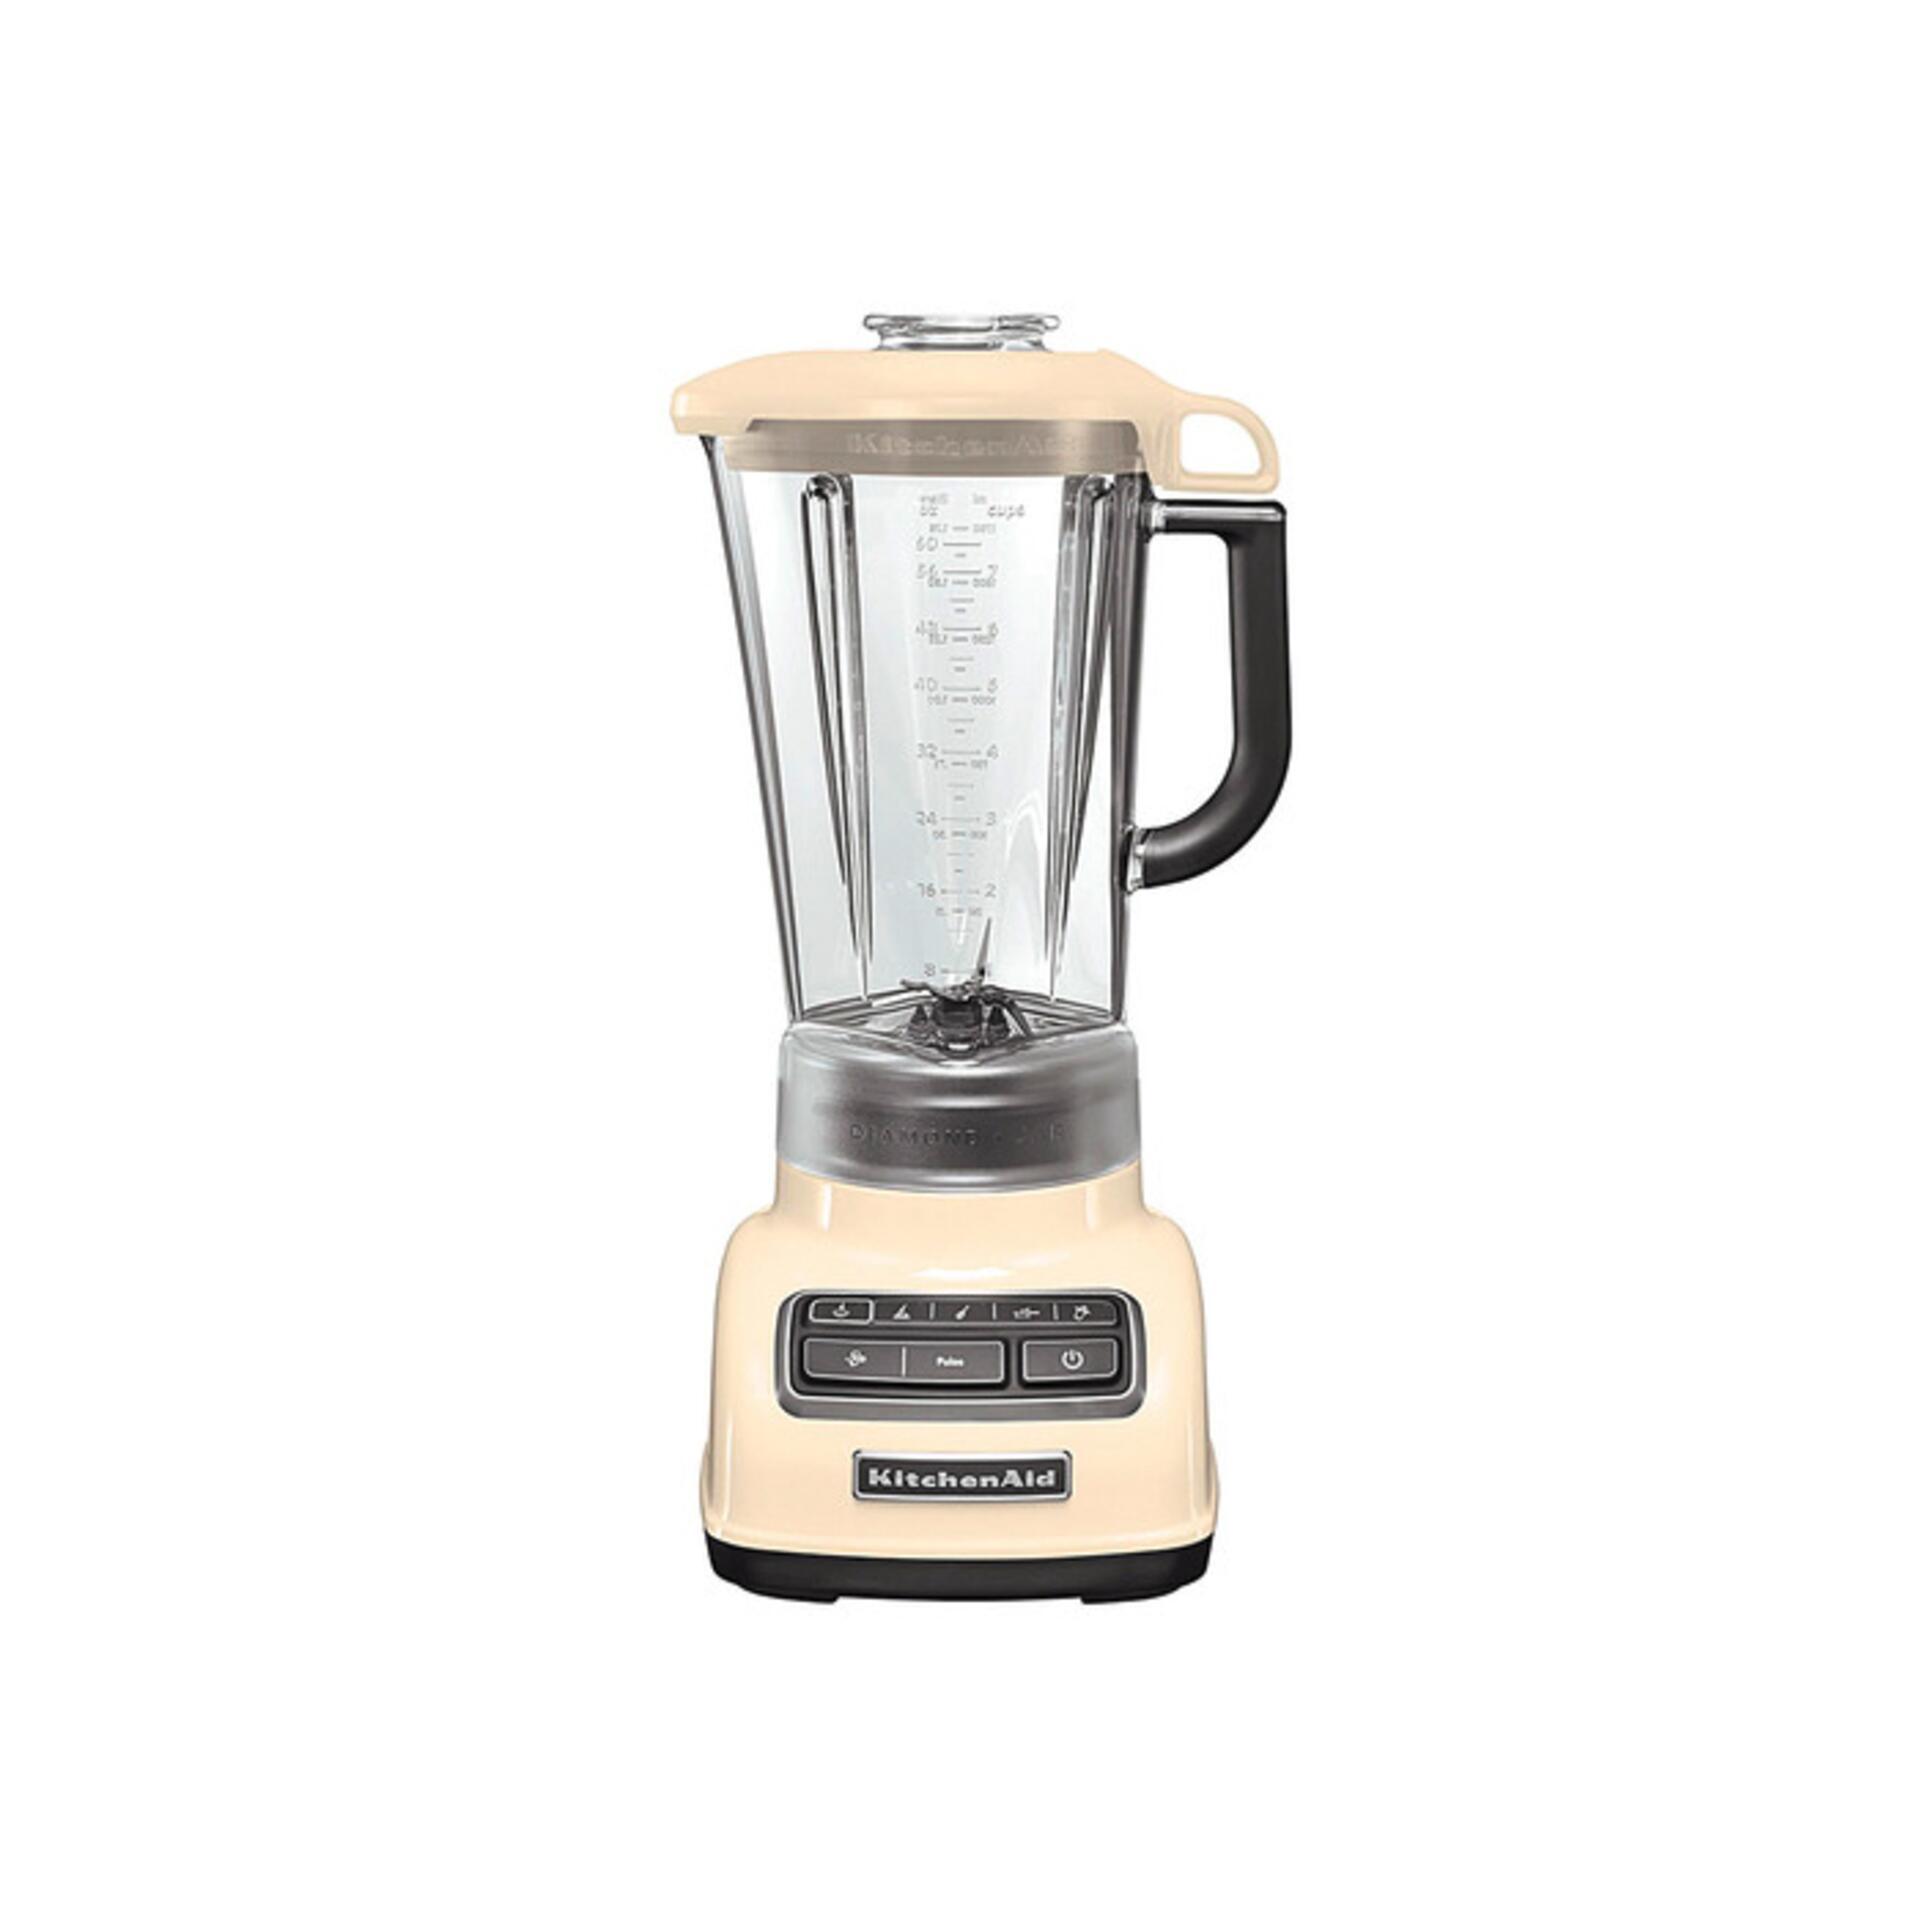 Kitchenaid Blender im Rautendesign Classic Crème 5KSB1585EAC